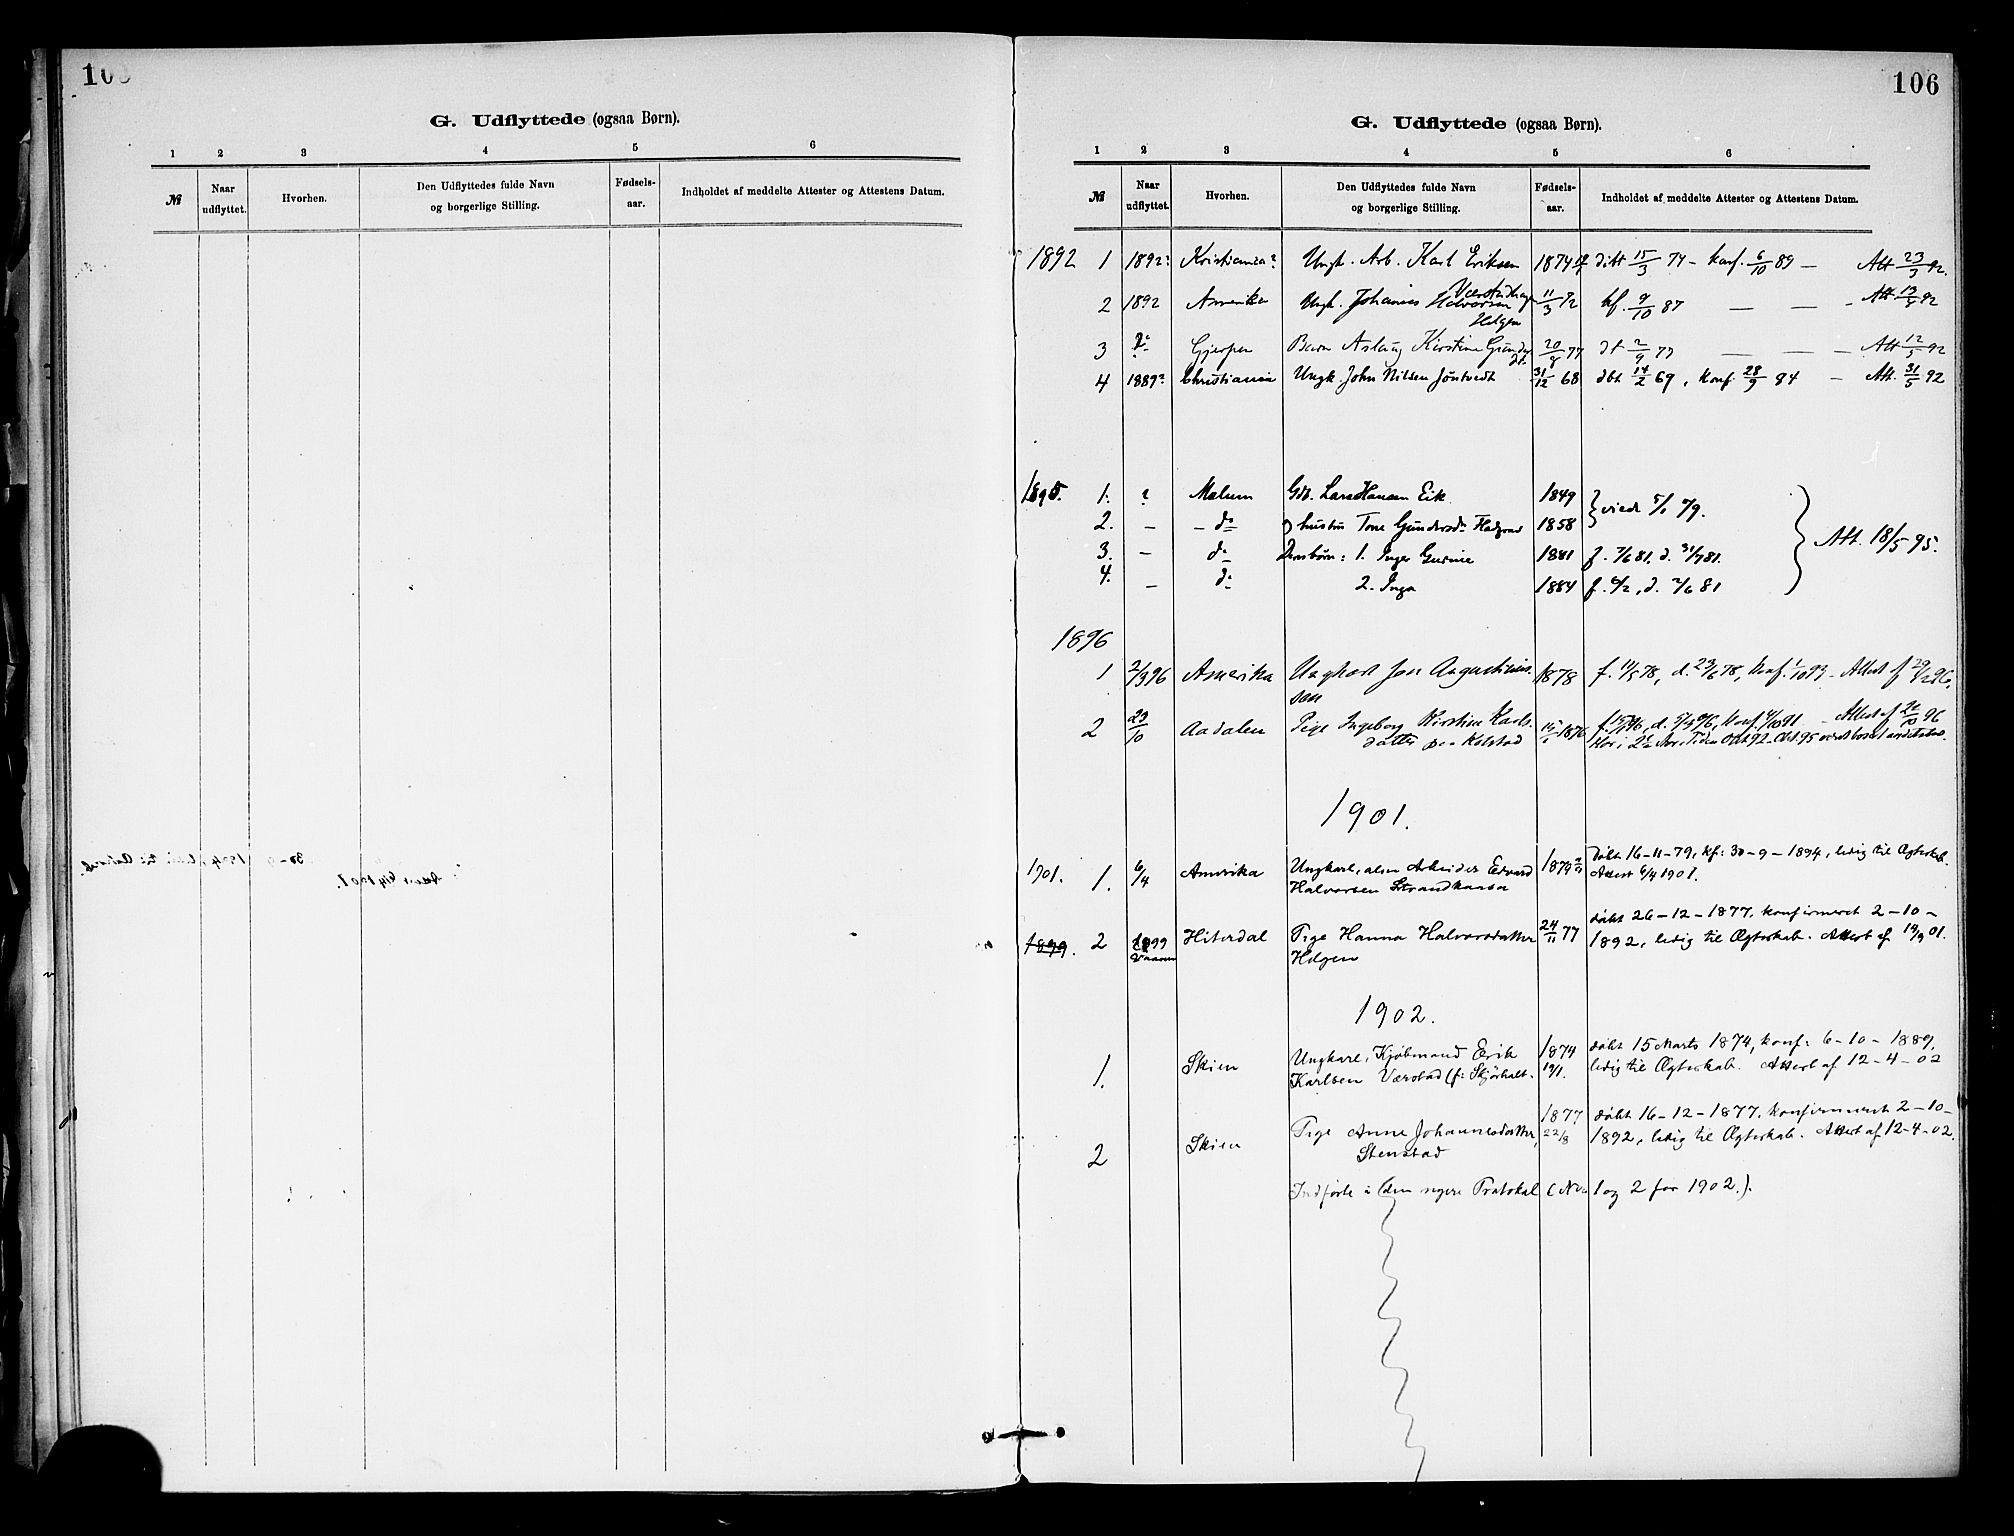 SAKO, Holla kirkebøker, F/Fa/L0009: Ministerialbok nr. 9, 1881-1897, s. 106